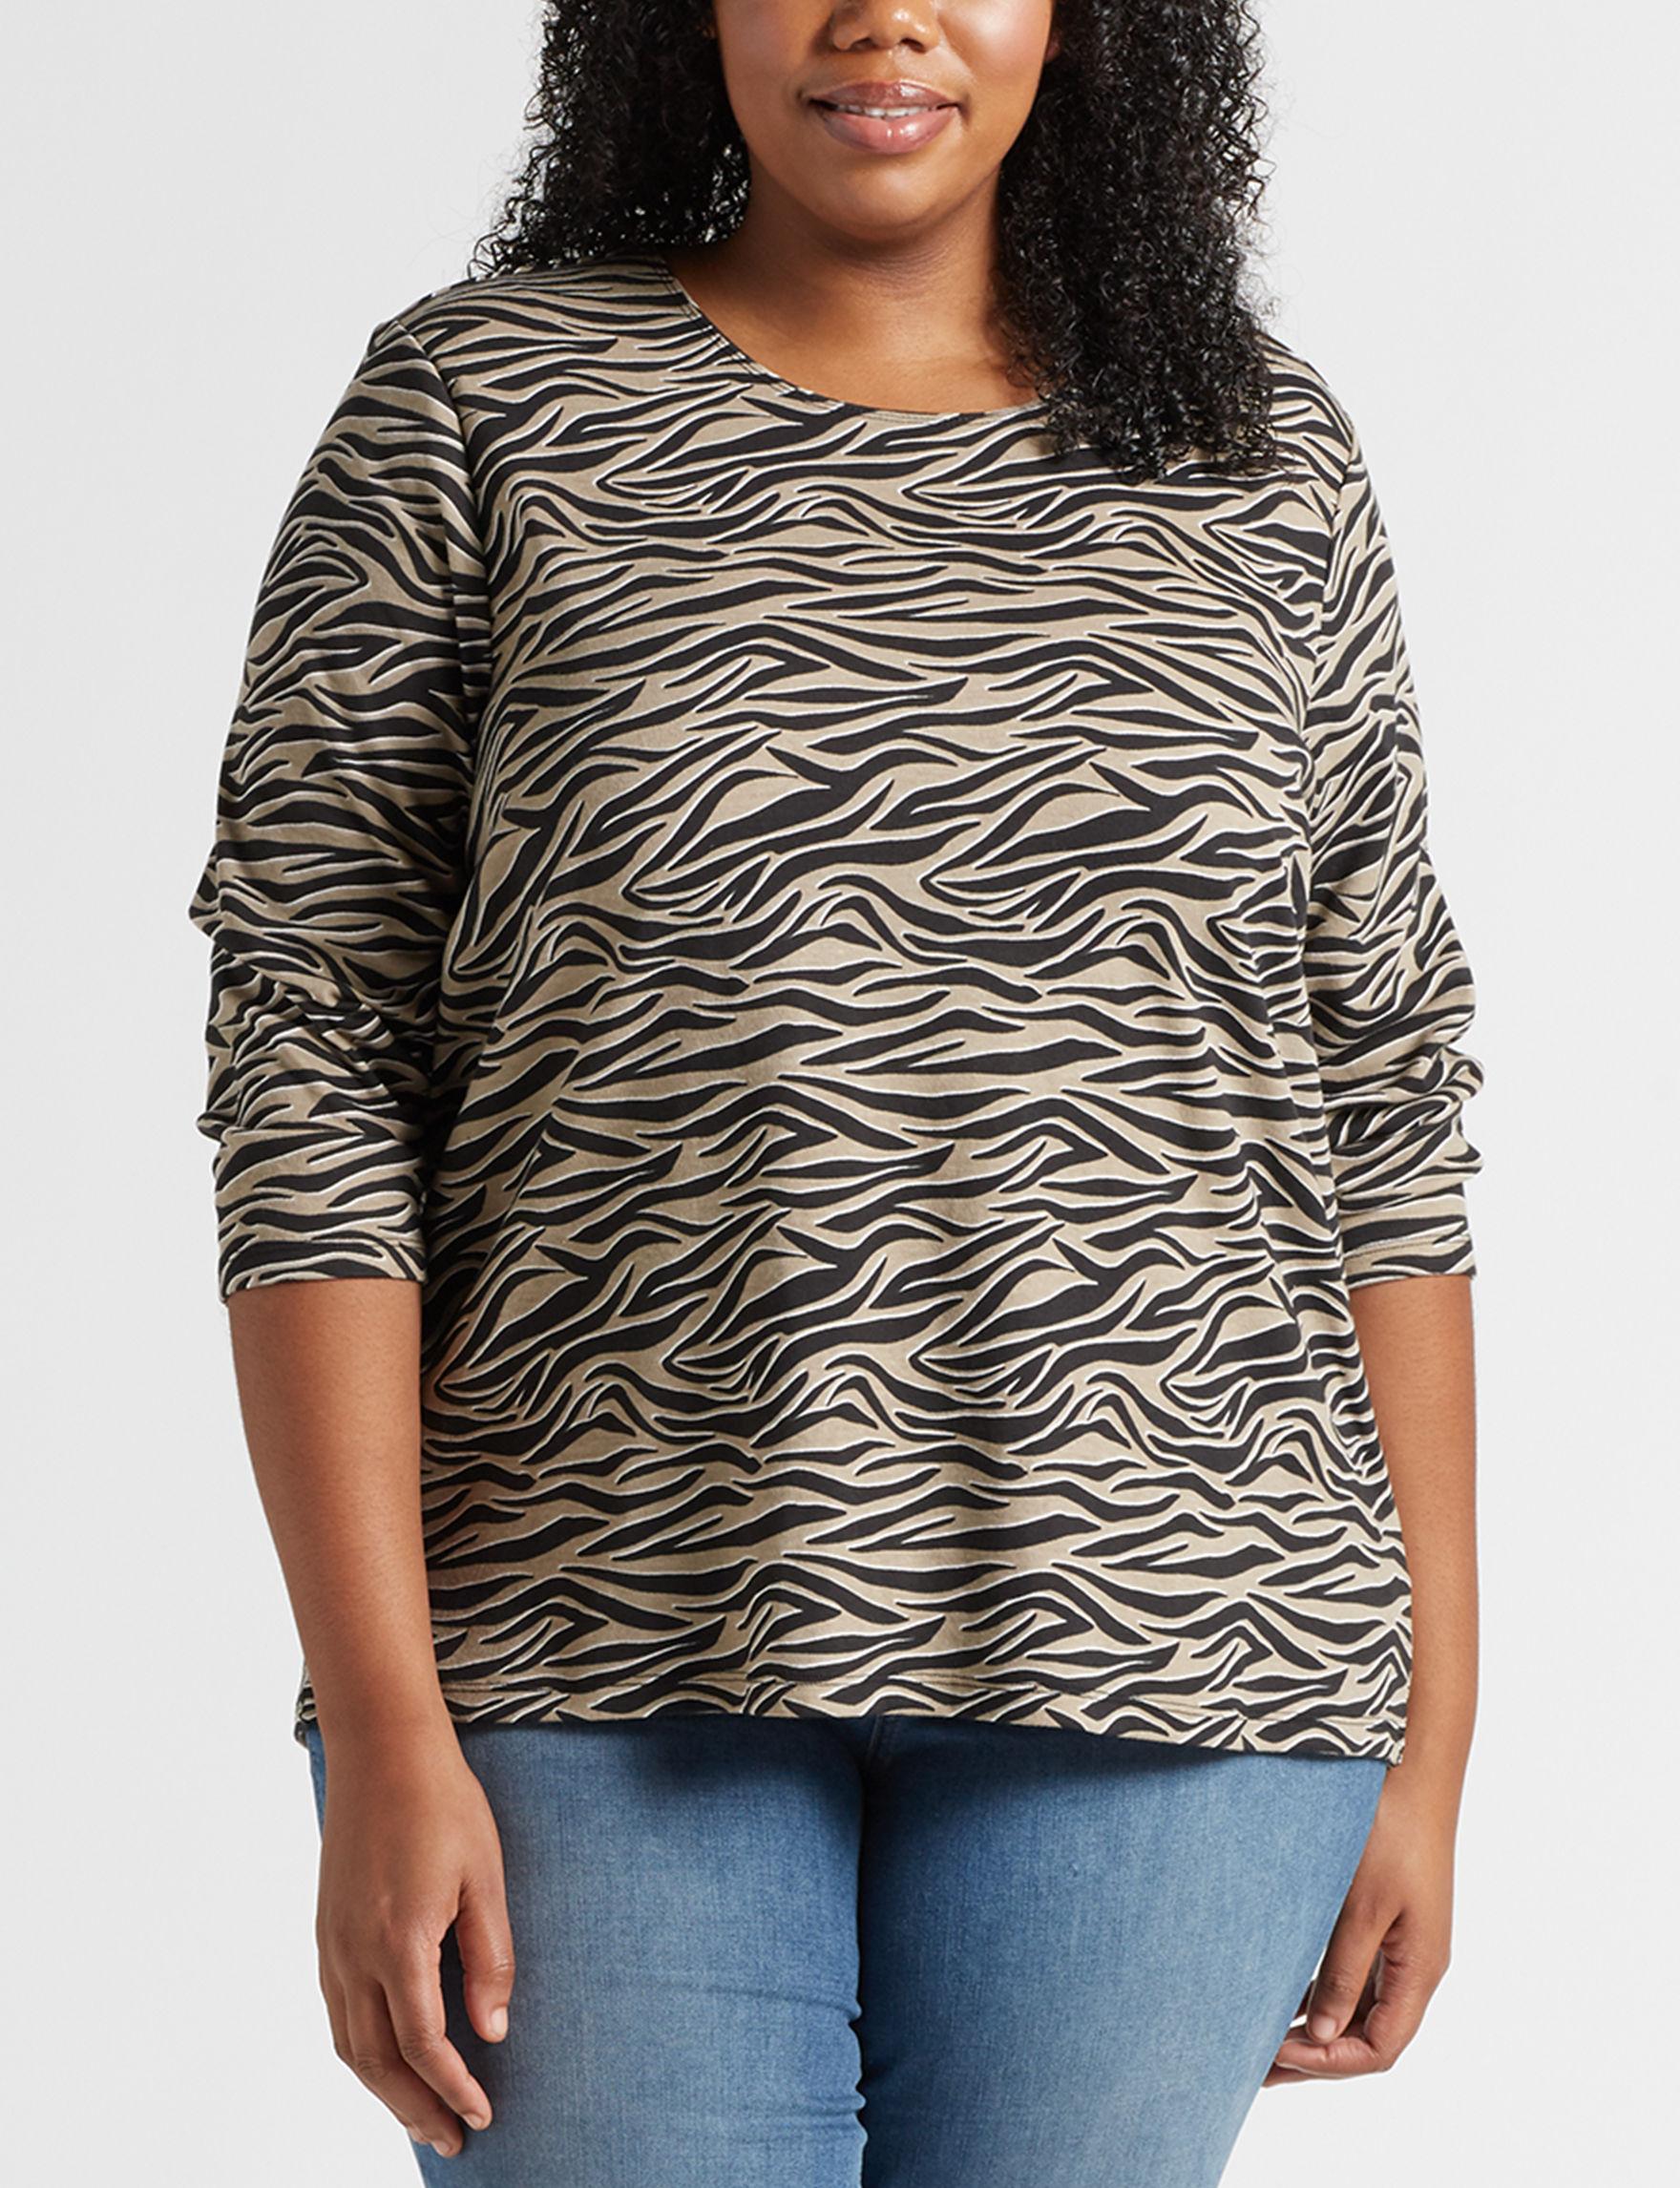 Rebecca Malone Brown / Black Shirts & Blouses